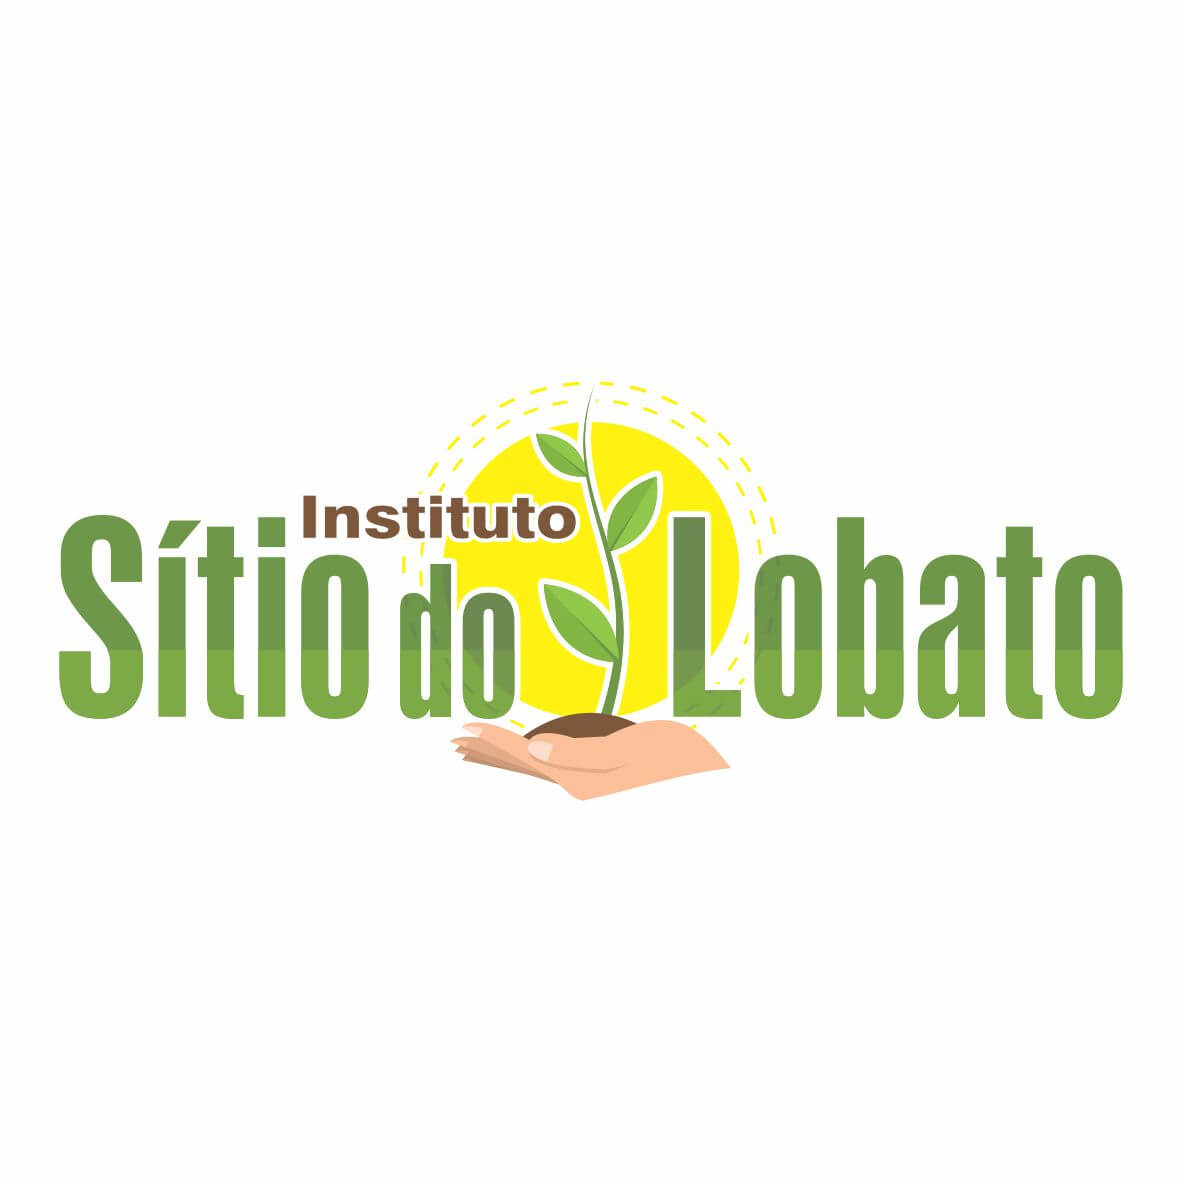 logomarca_instituto_sitio_do_lobato